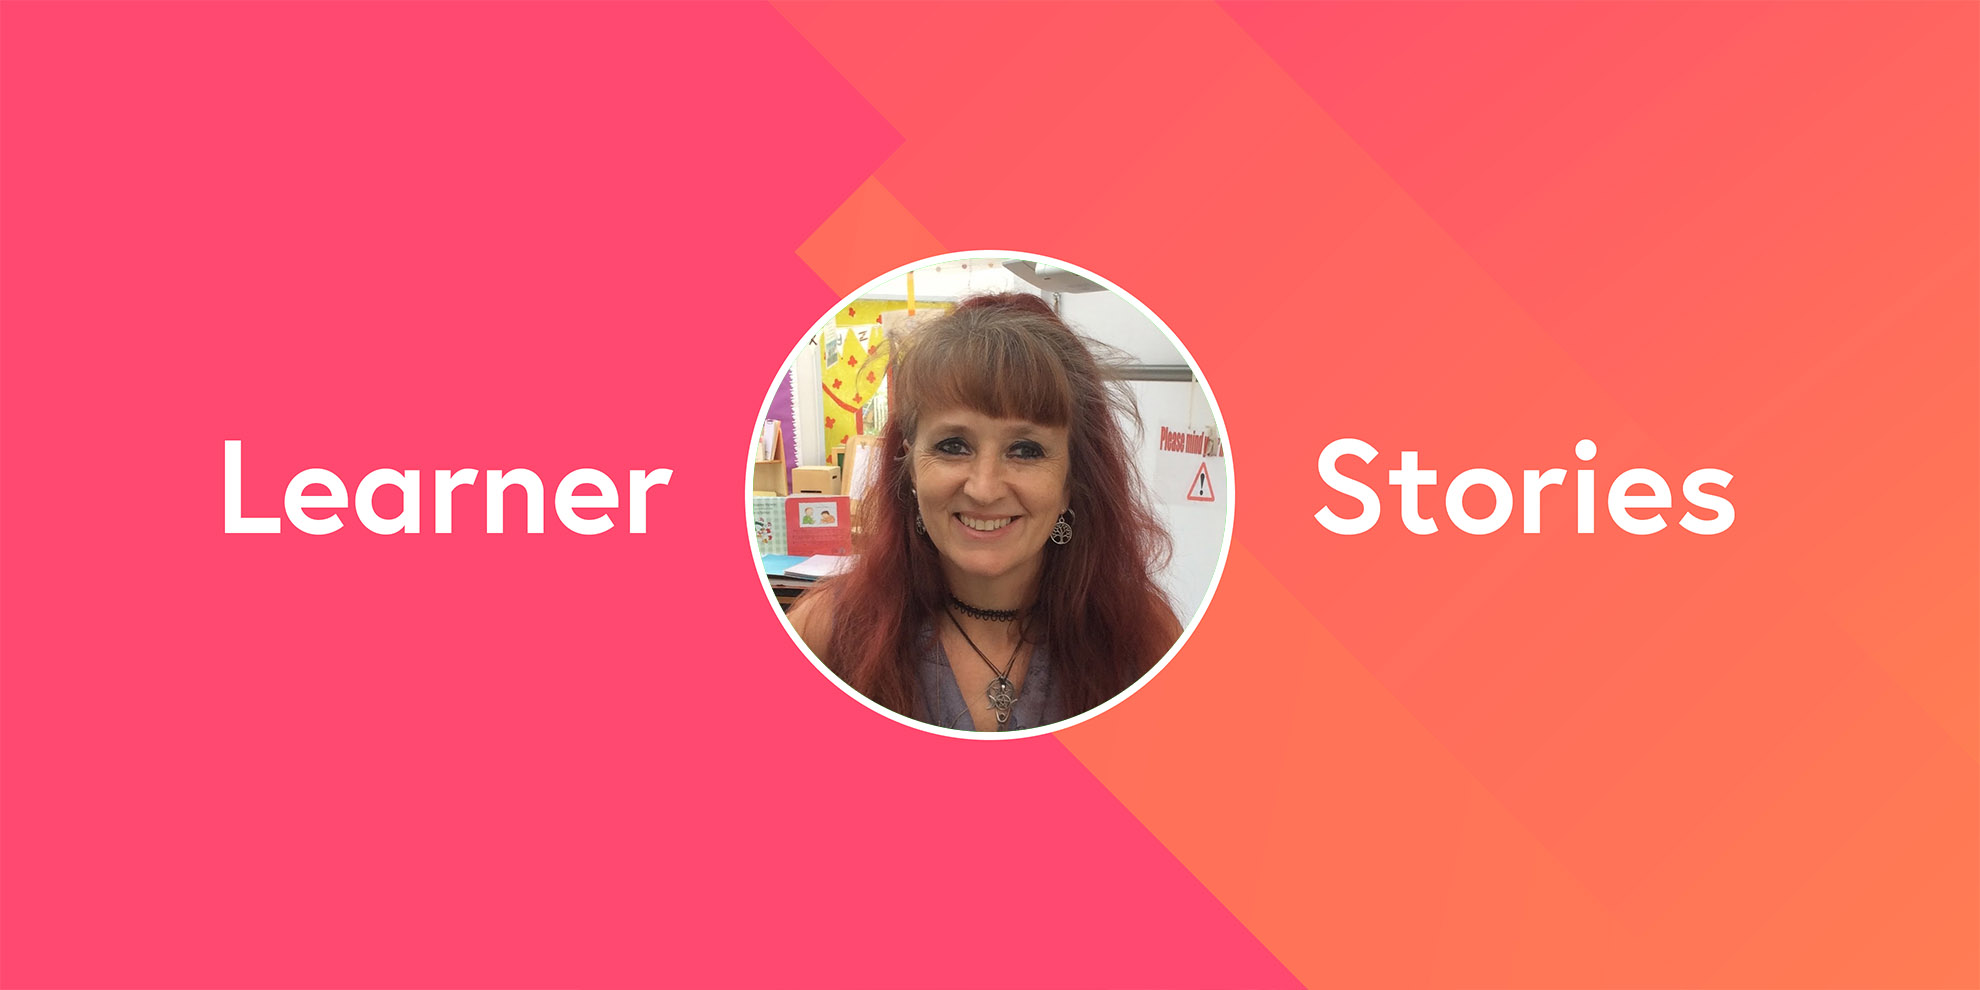 Fl245 Blog Series Learner Stories Banner Amanda